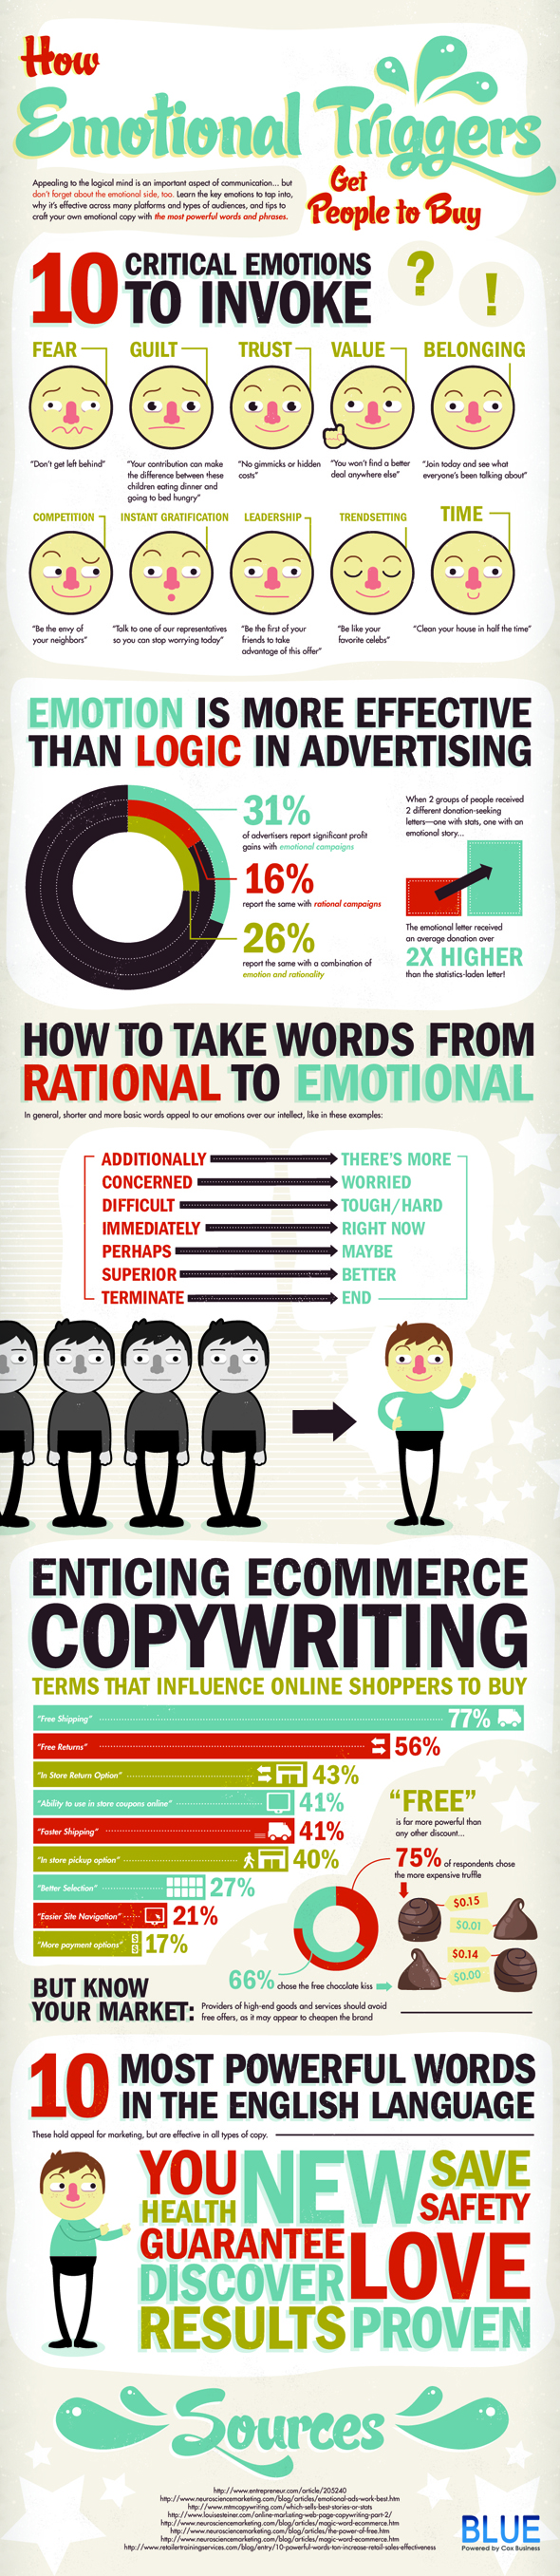 emotional-triggers-buy